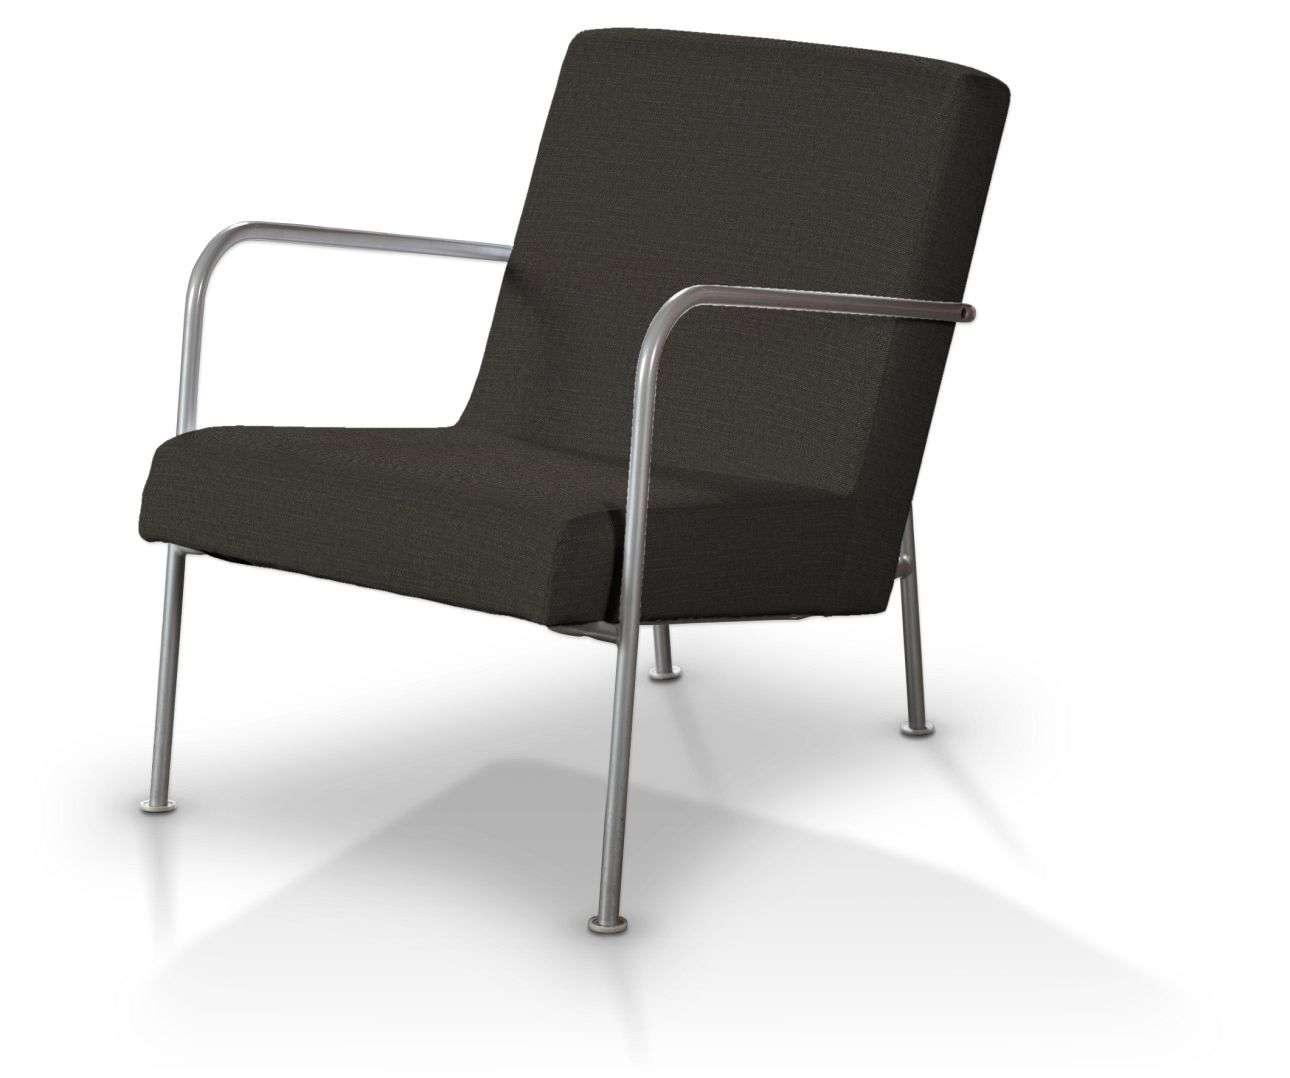 Ikea PS Sesselbezug von der Kollektion Vintage, Stoff: 702-36